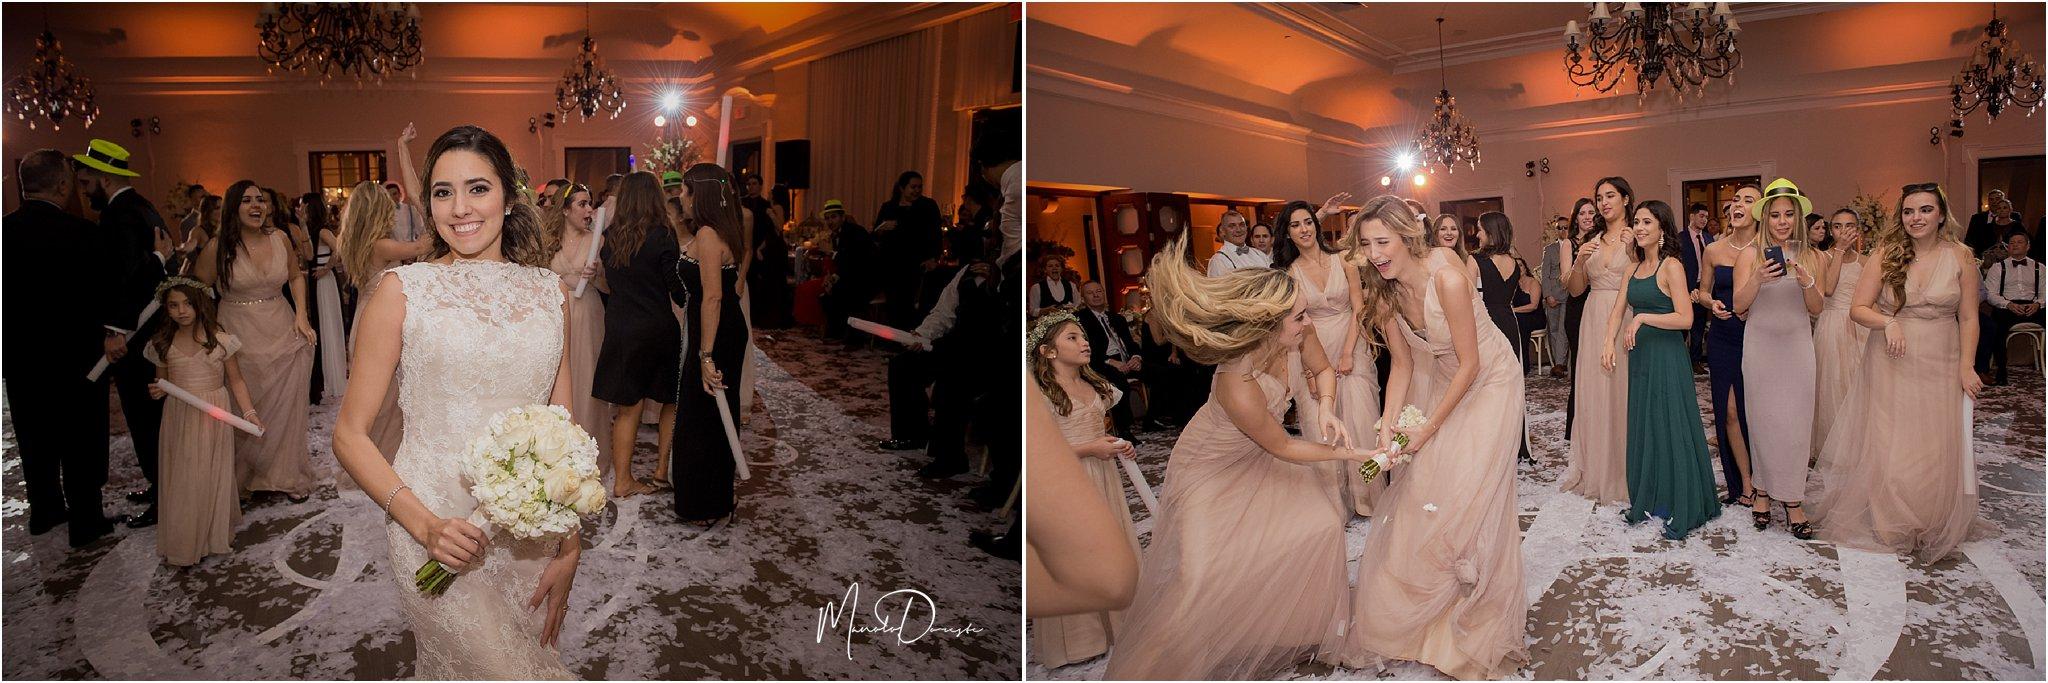 00947_ManoloDoreste_InFocusStudios_Wedding_Family_Photography_Miami_MiamiPhotographer.jpg